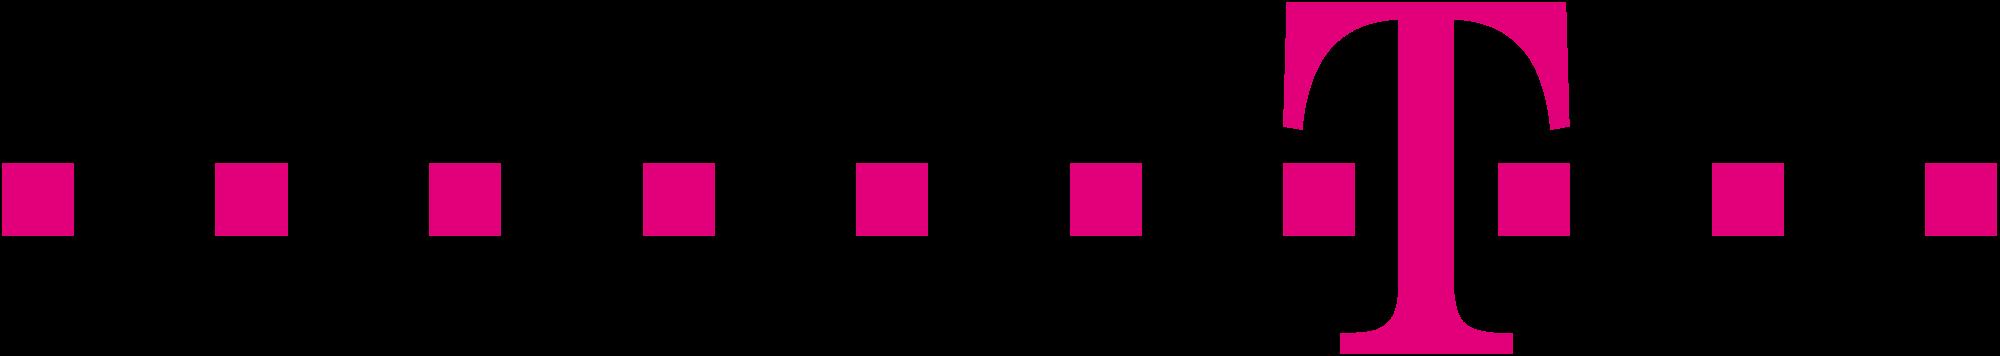 Https Reincarcareonline Wordpress Com 2017 06 19 Optiuni Telekom Operă